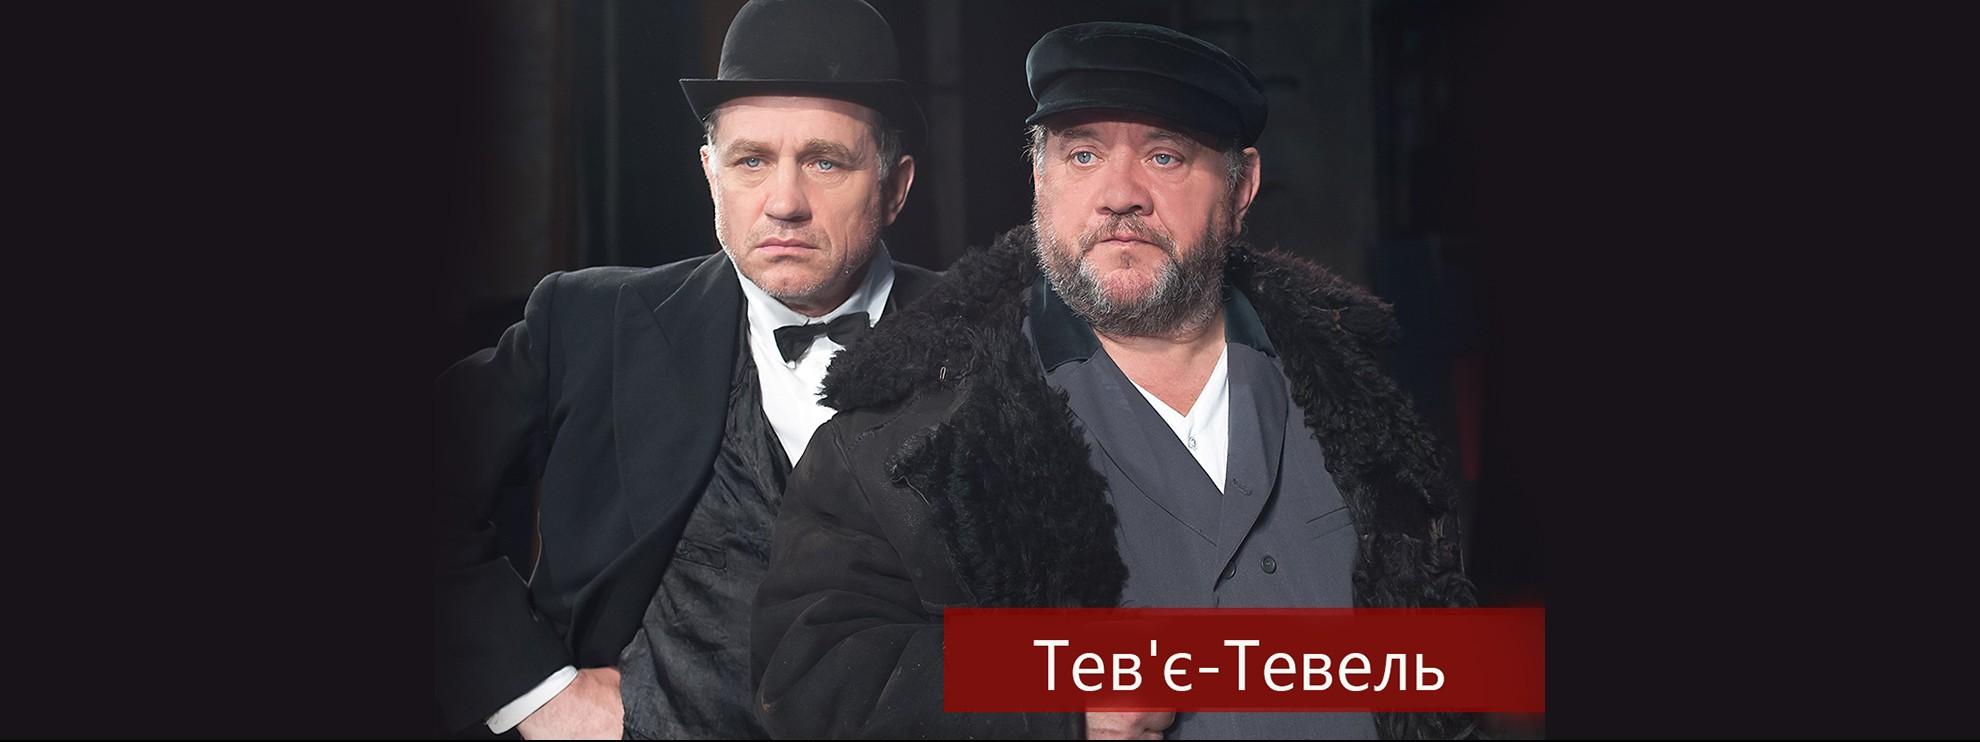 event Tevye-Tevel